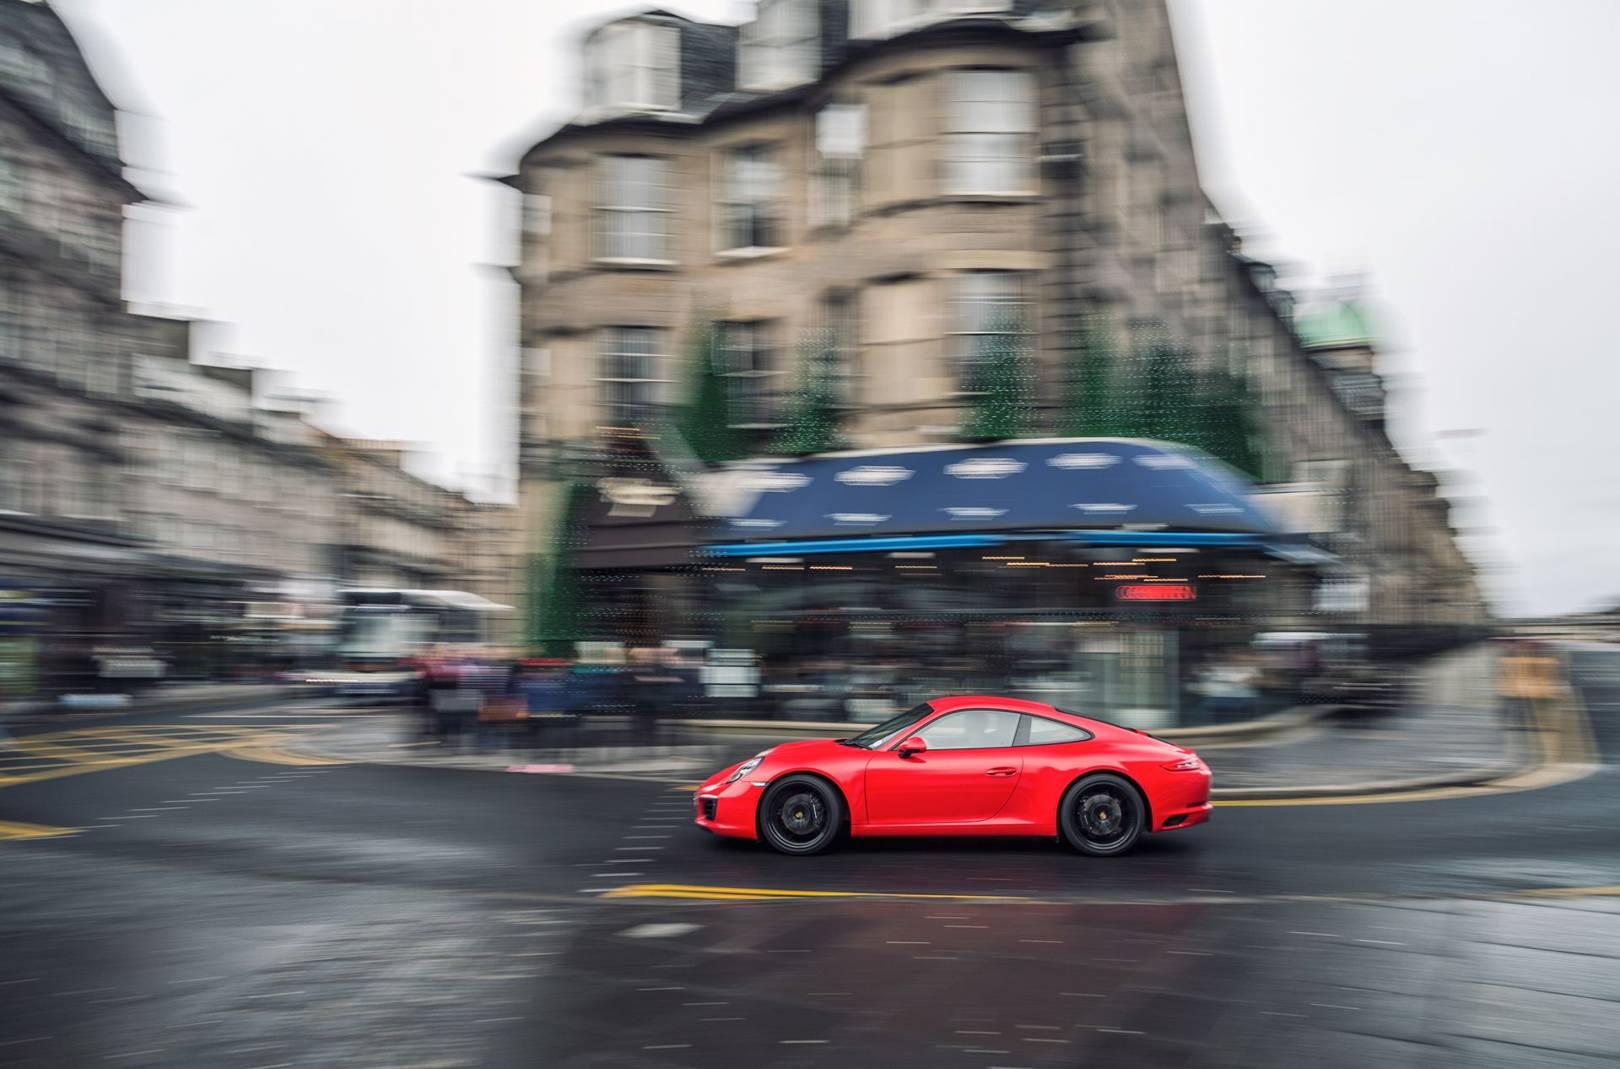 Porsche 911 red book porsche car source red porsche lifestyle the lady in red t lifestyle fandeluxe Gallery